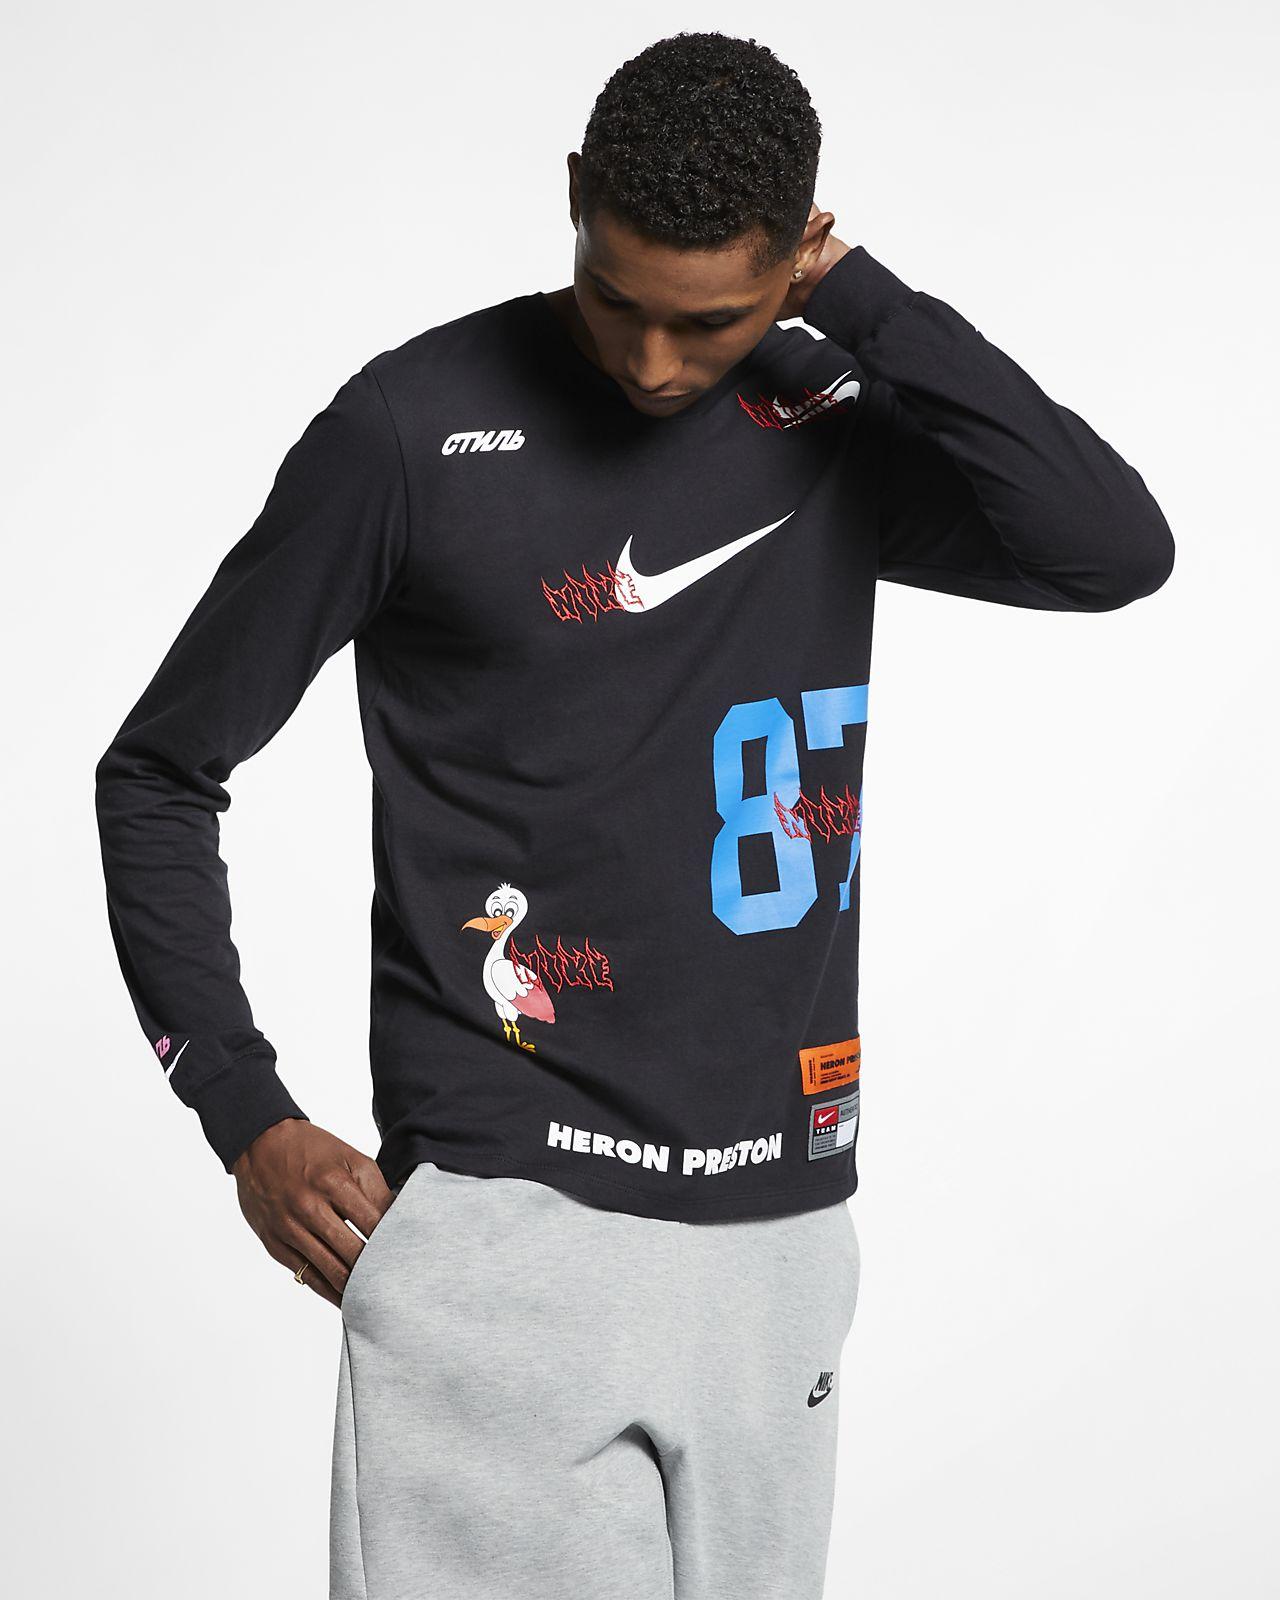 22df4ad3 Nike x Heron Preston Men's Long-Sleeve T-Shirt